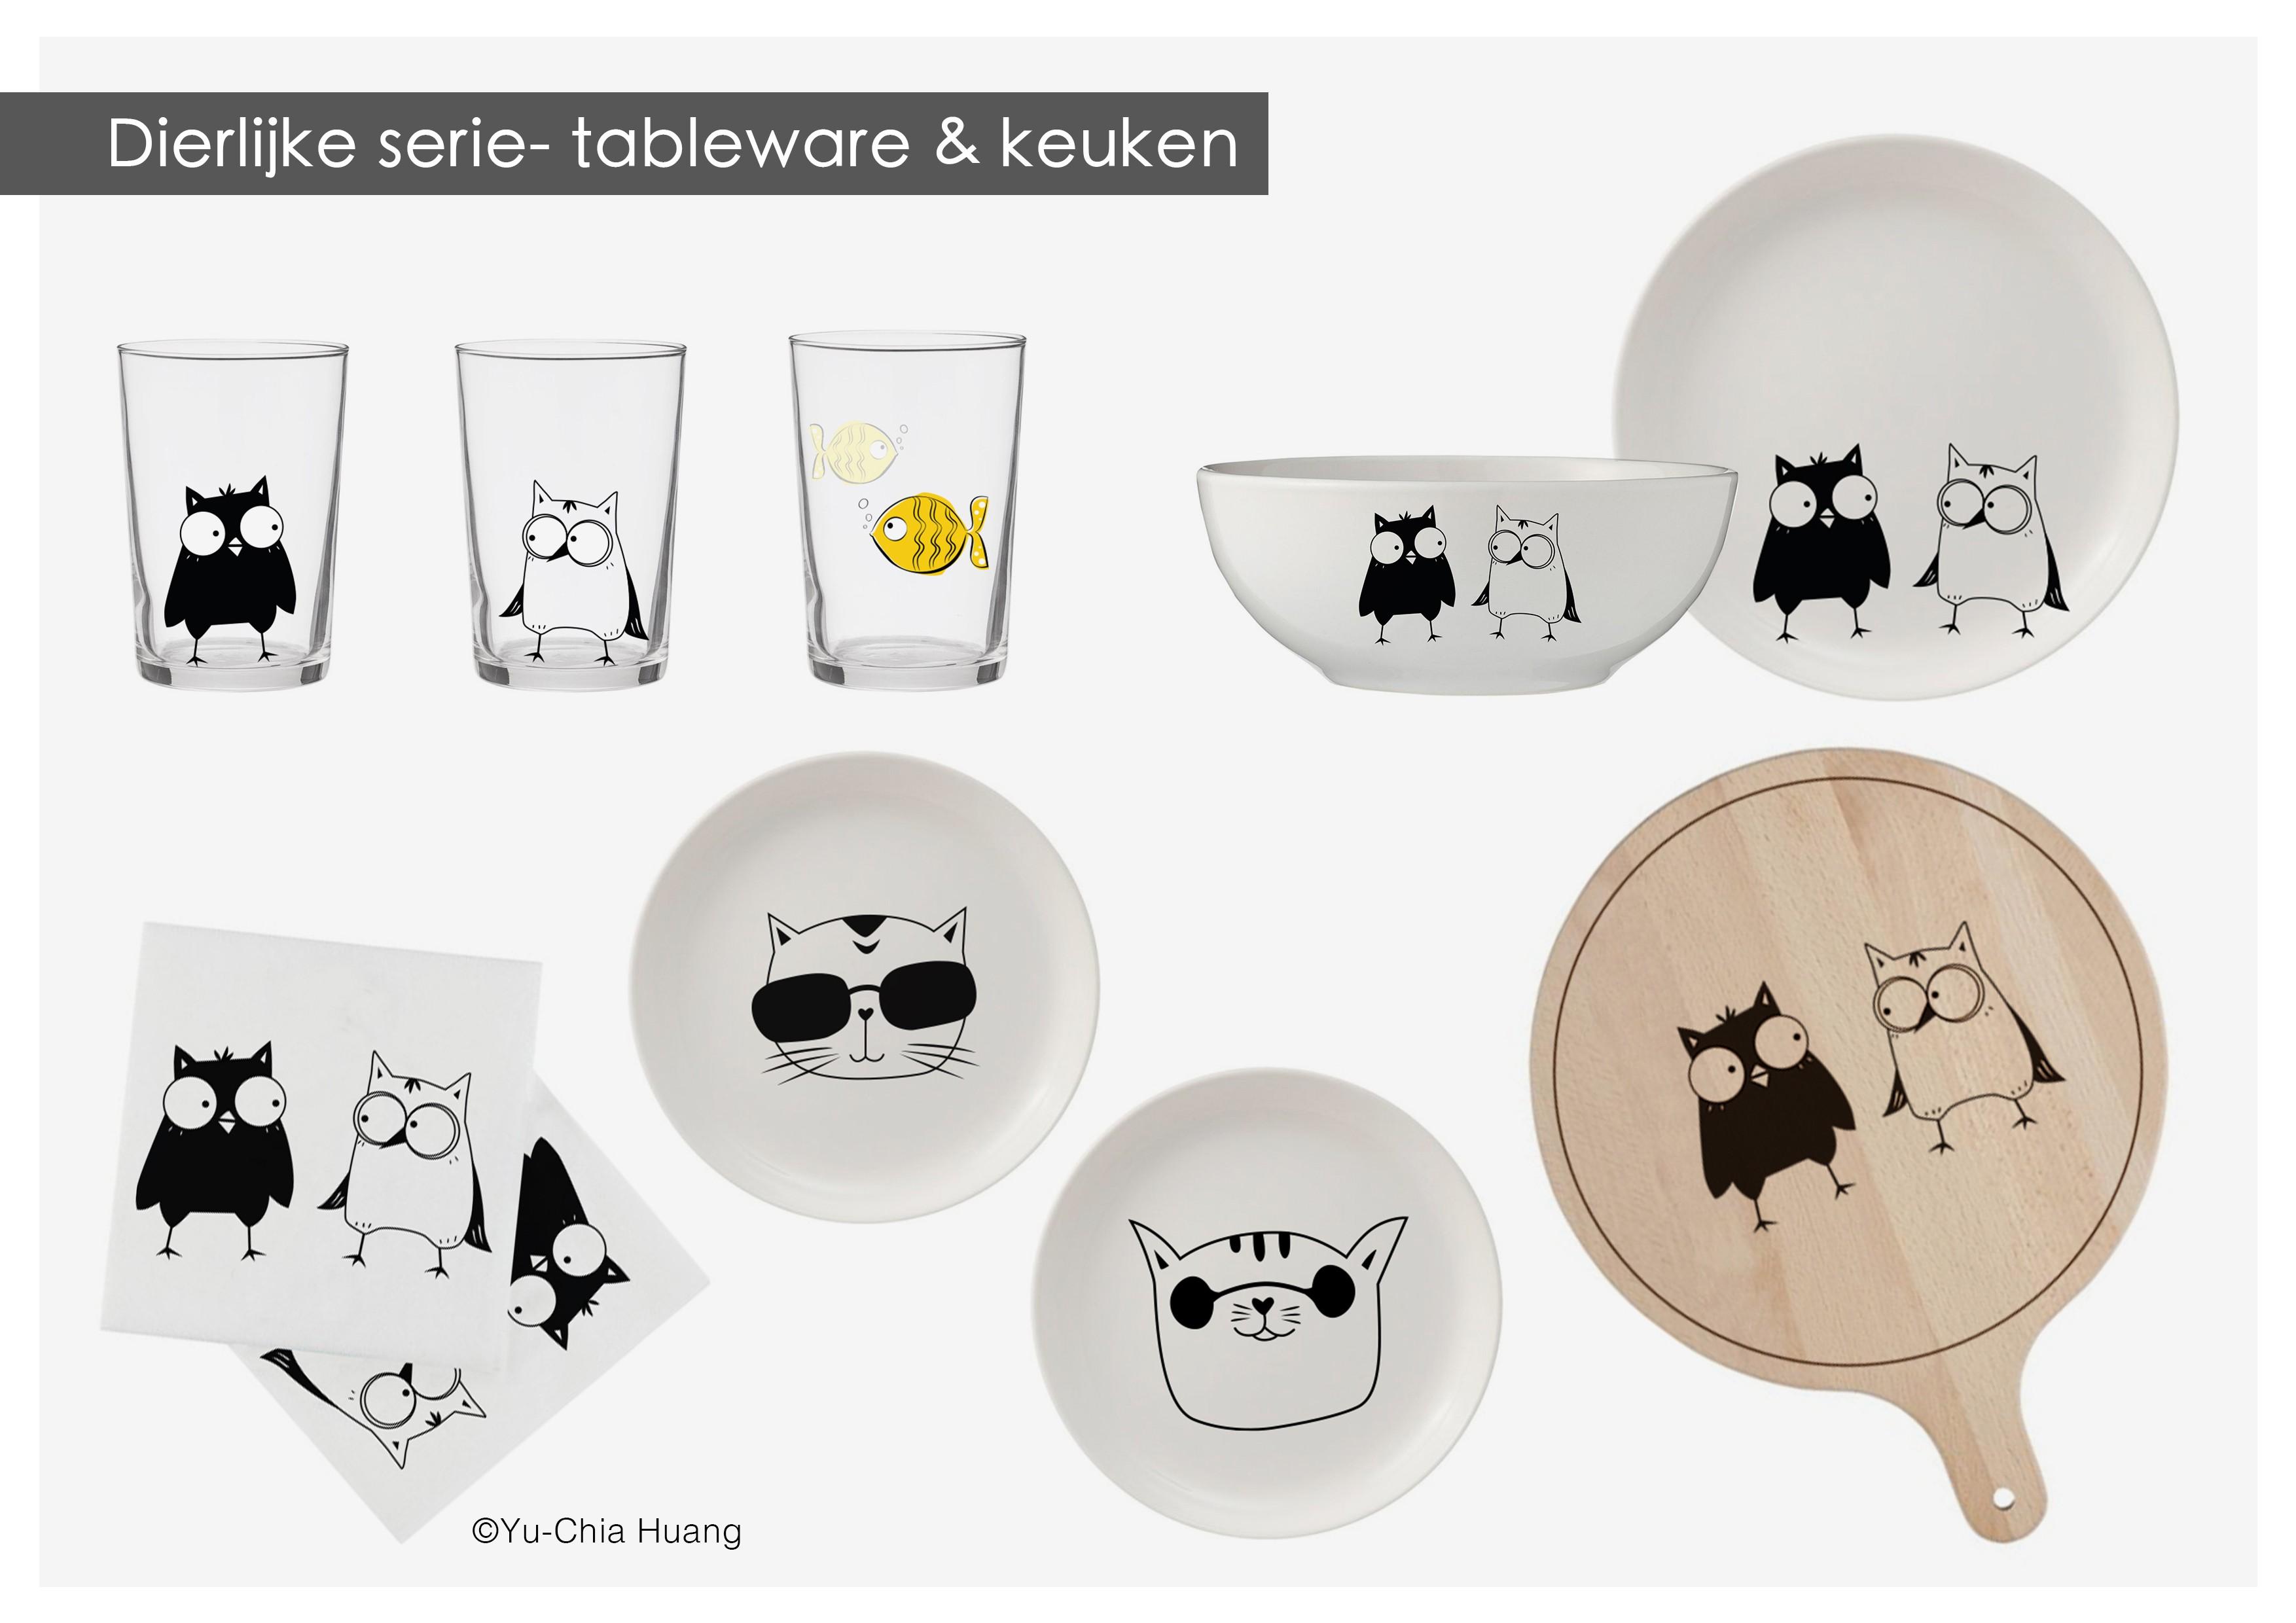 dierlijke-serie-tableware-keuken